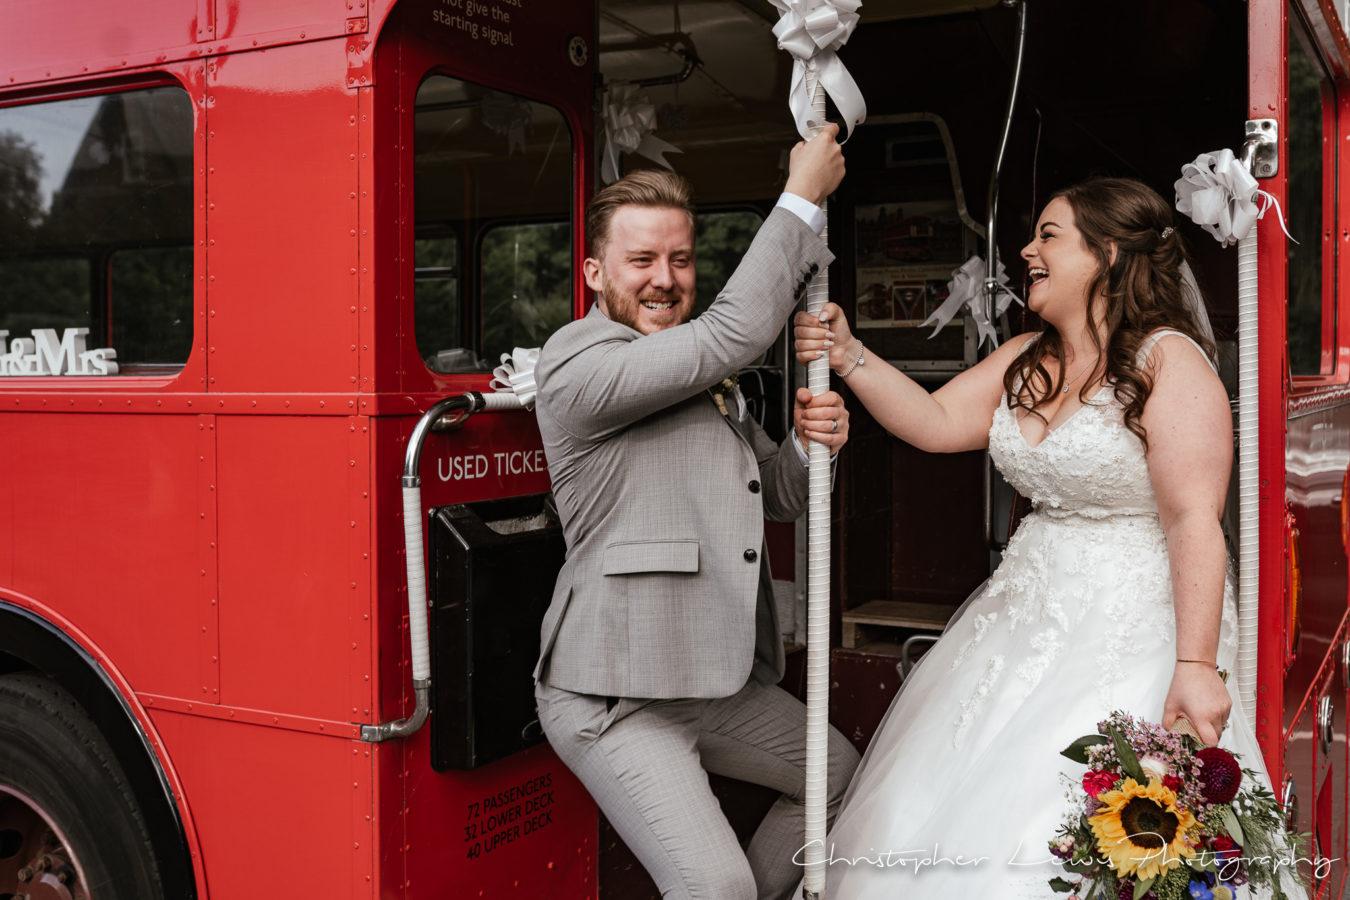 Salmesbury Hall Wedding - 19